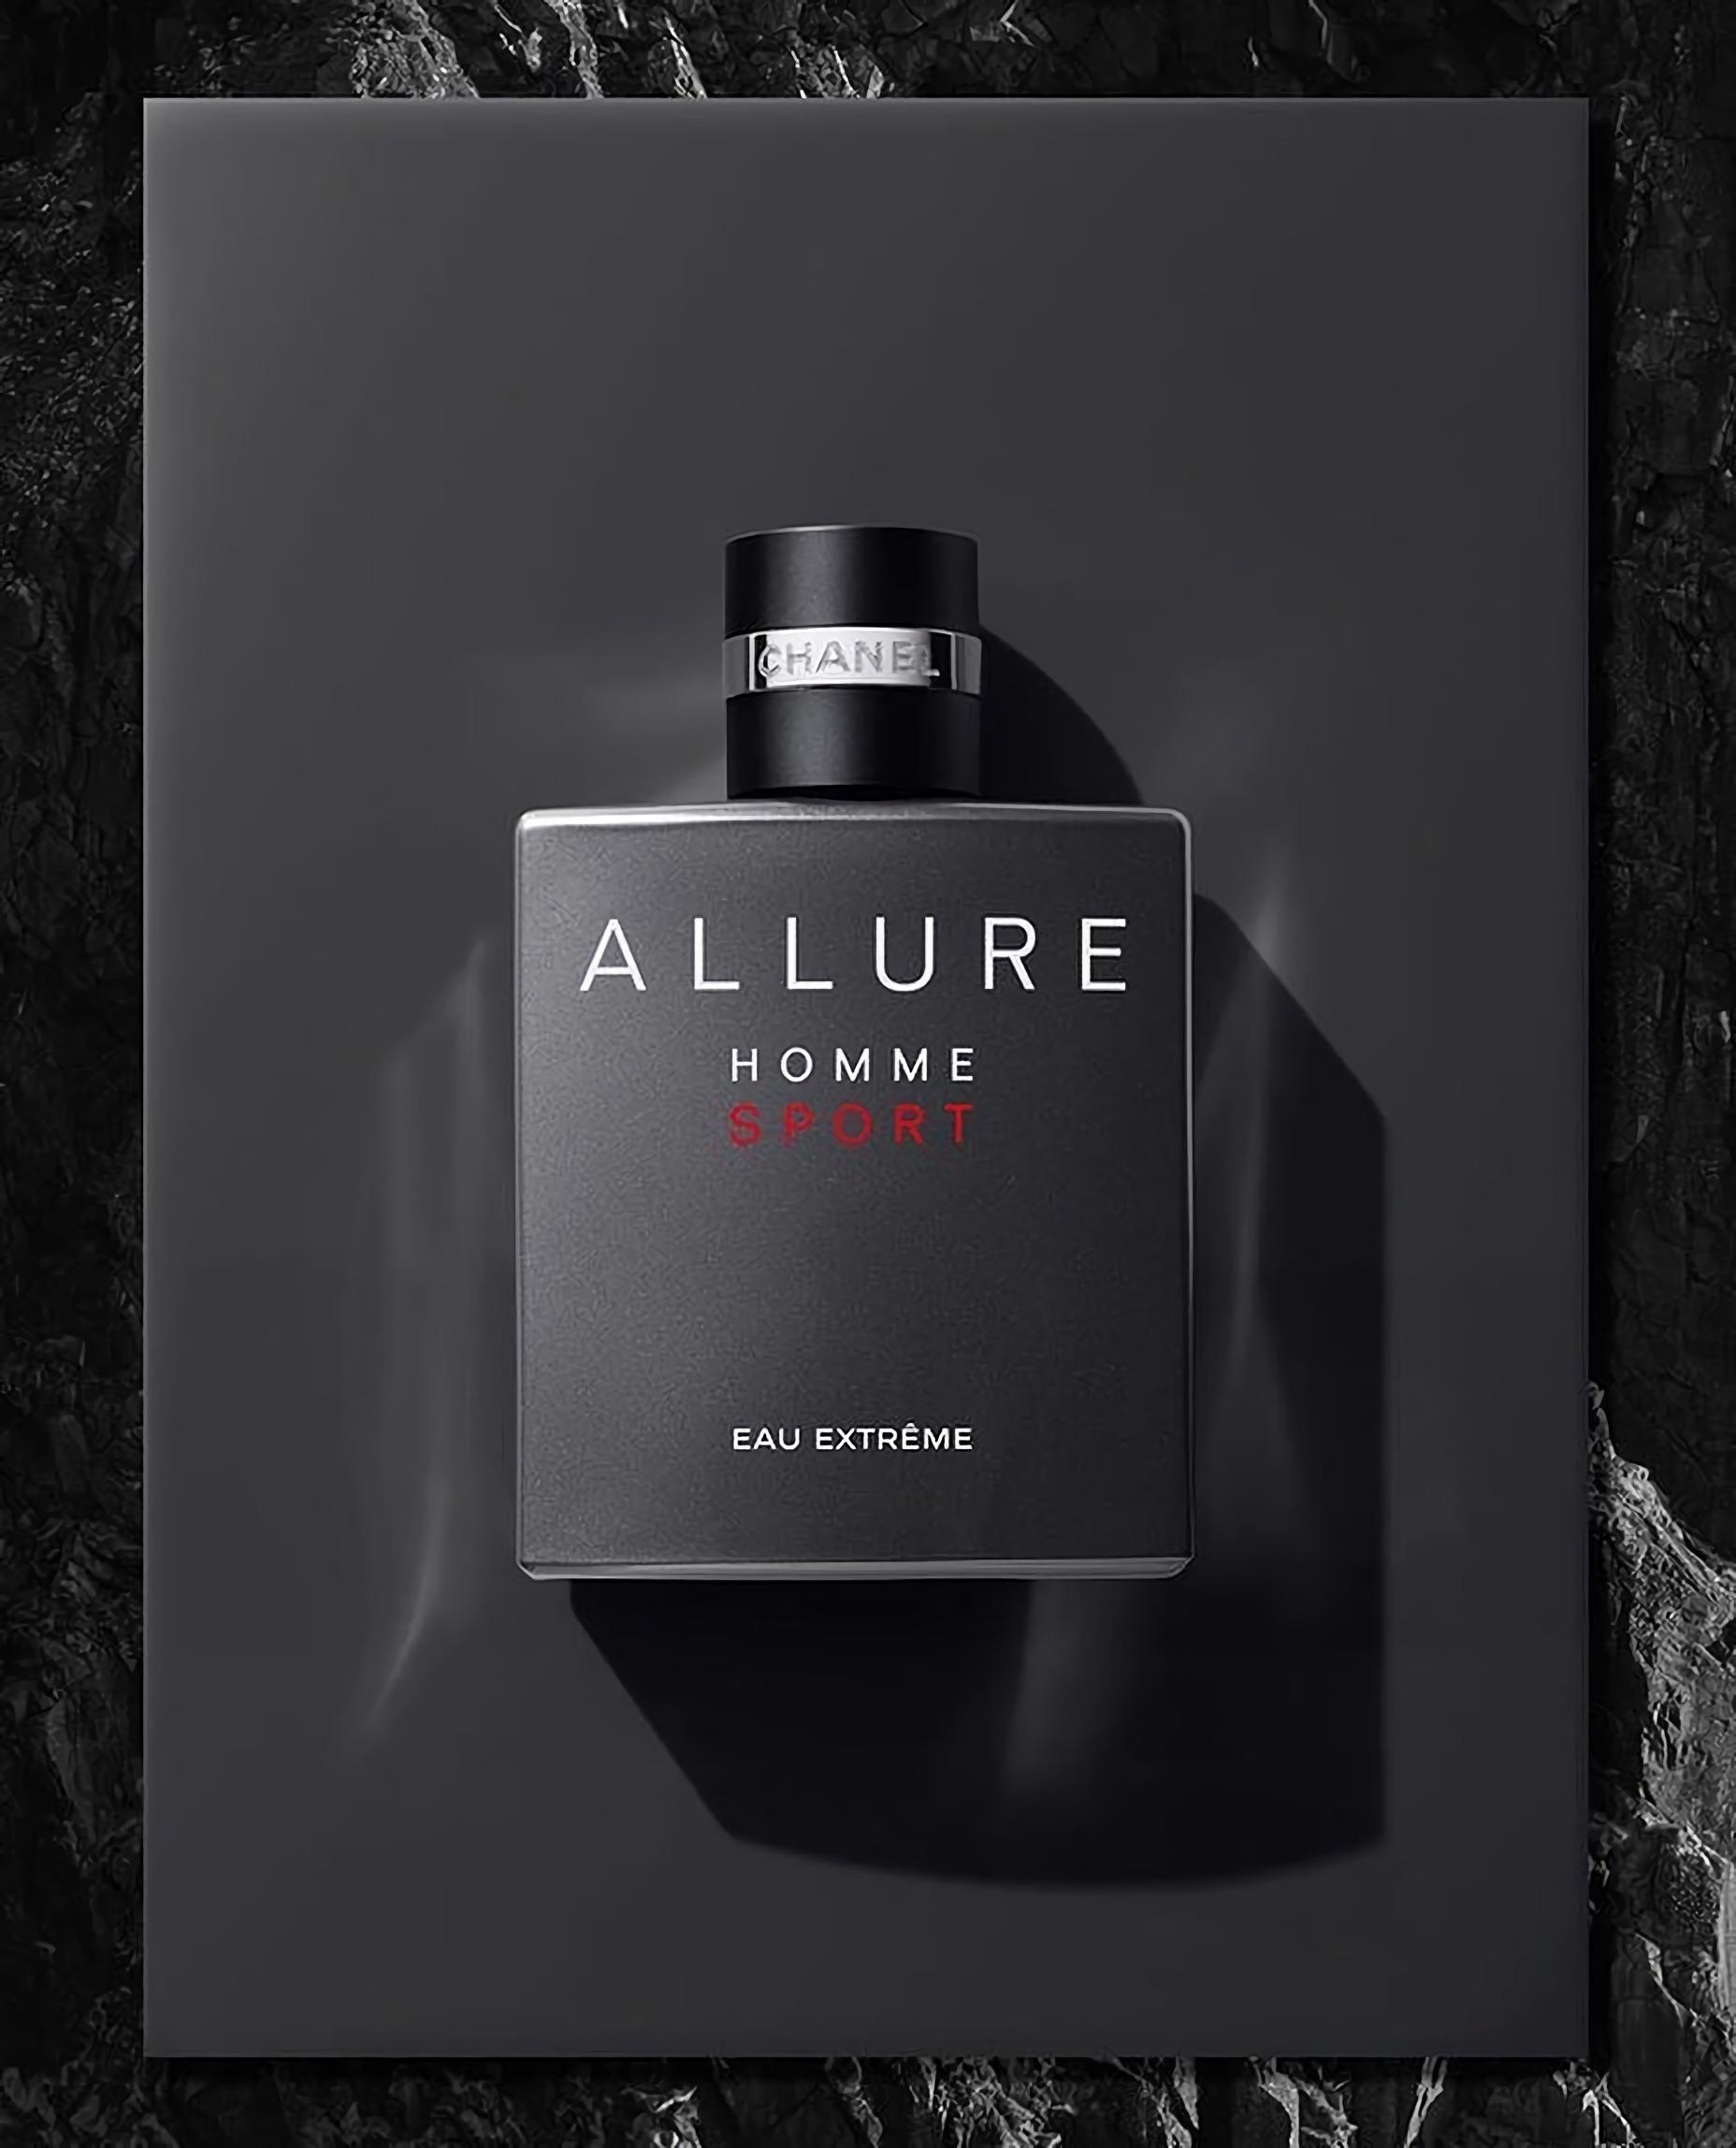 лучшие духи для мужчин Chanel Allure Homme Sport Eau Extreme